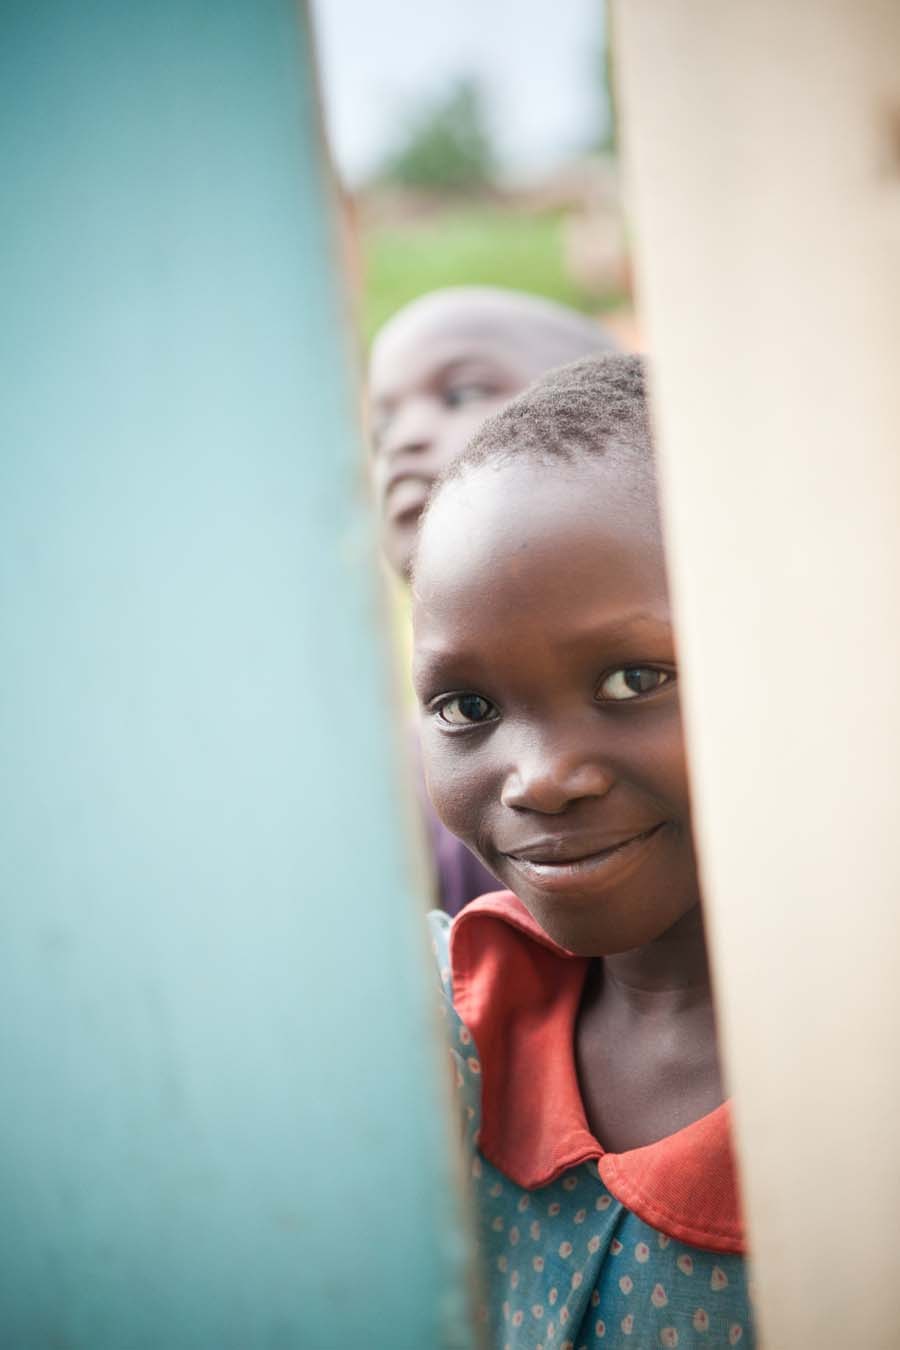 jessicadavisphotography.com | Jessica Davis Photography | Portrait Work in Uganda| Travel Photographer | World Event Photographs 2 (2).jpg